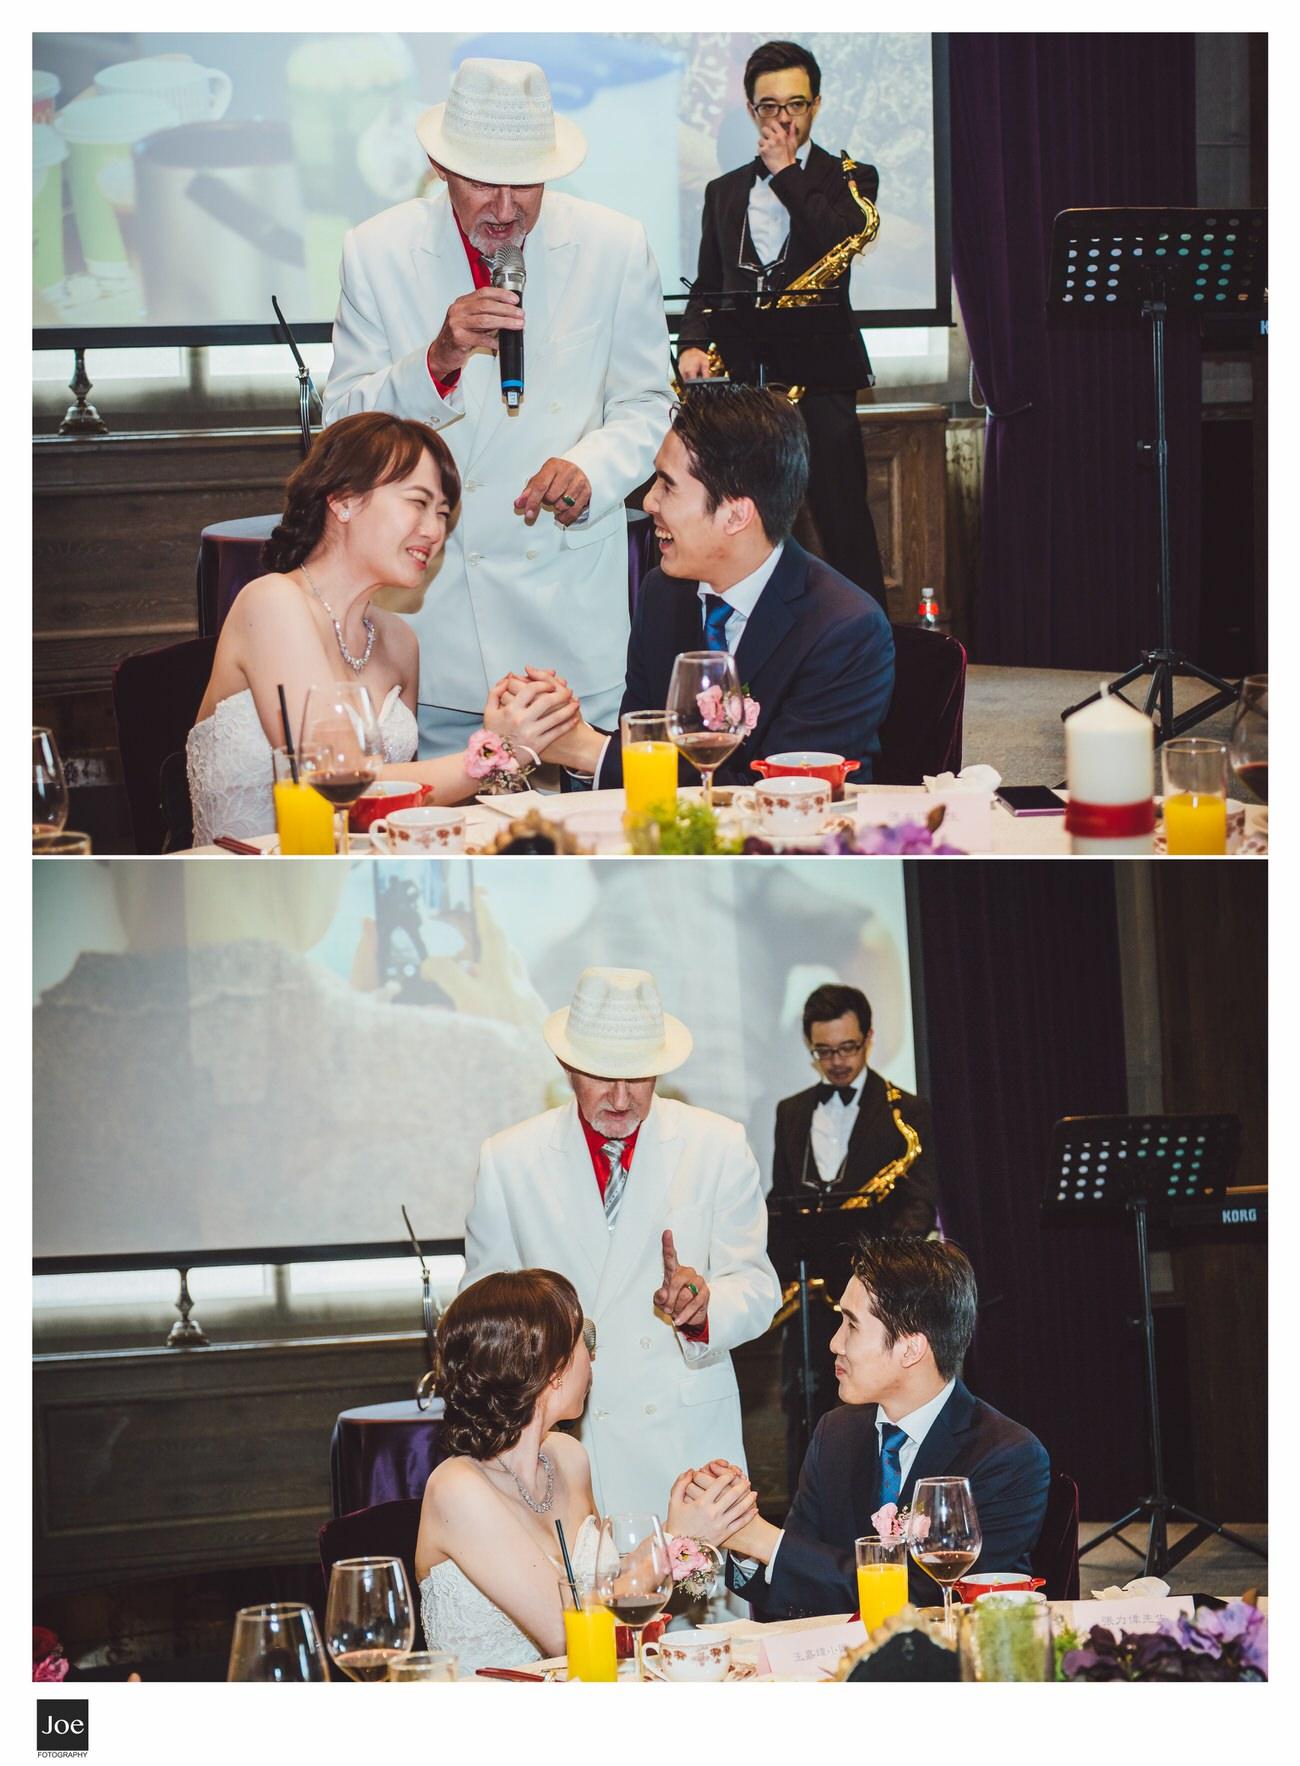 joe-fotography-wedding-photo-palais-de-chine-hotel-046.jpg